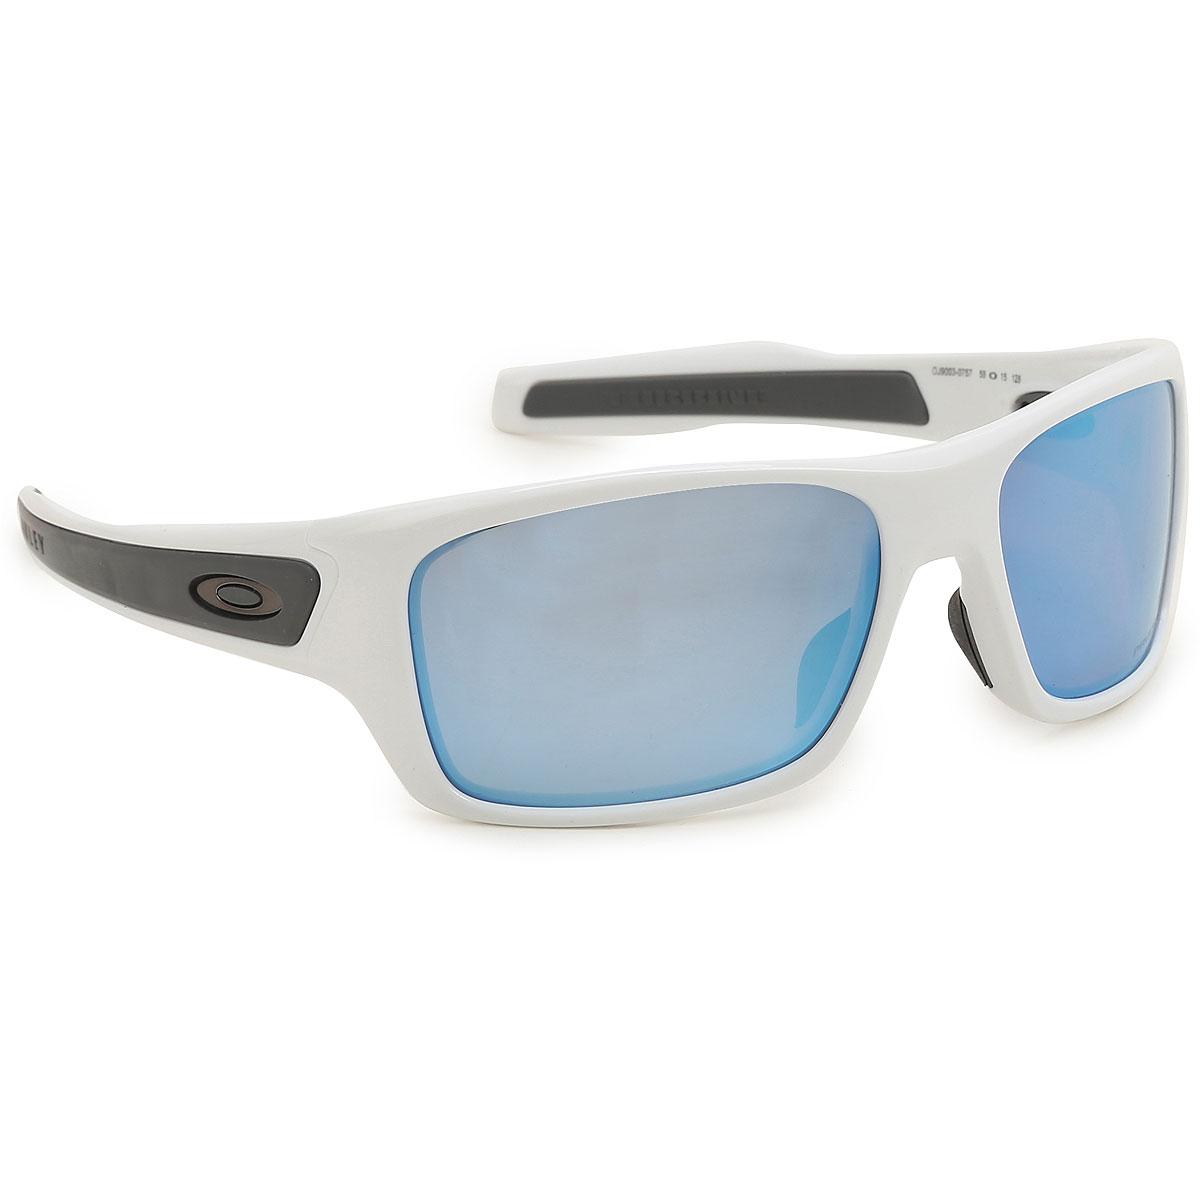 Oakley Kids Sunglasses for Boys On Sale, White, 2019